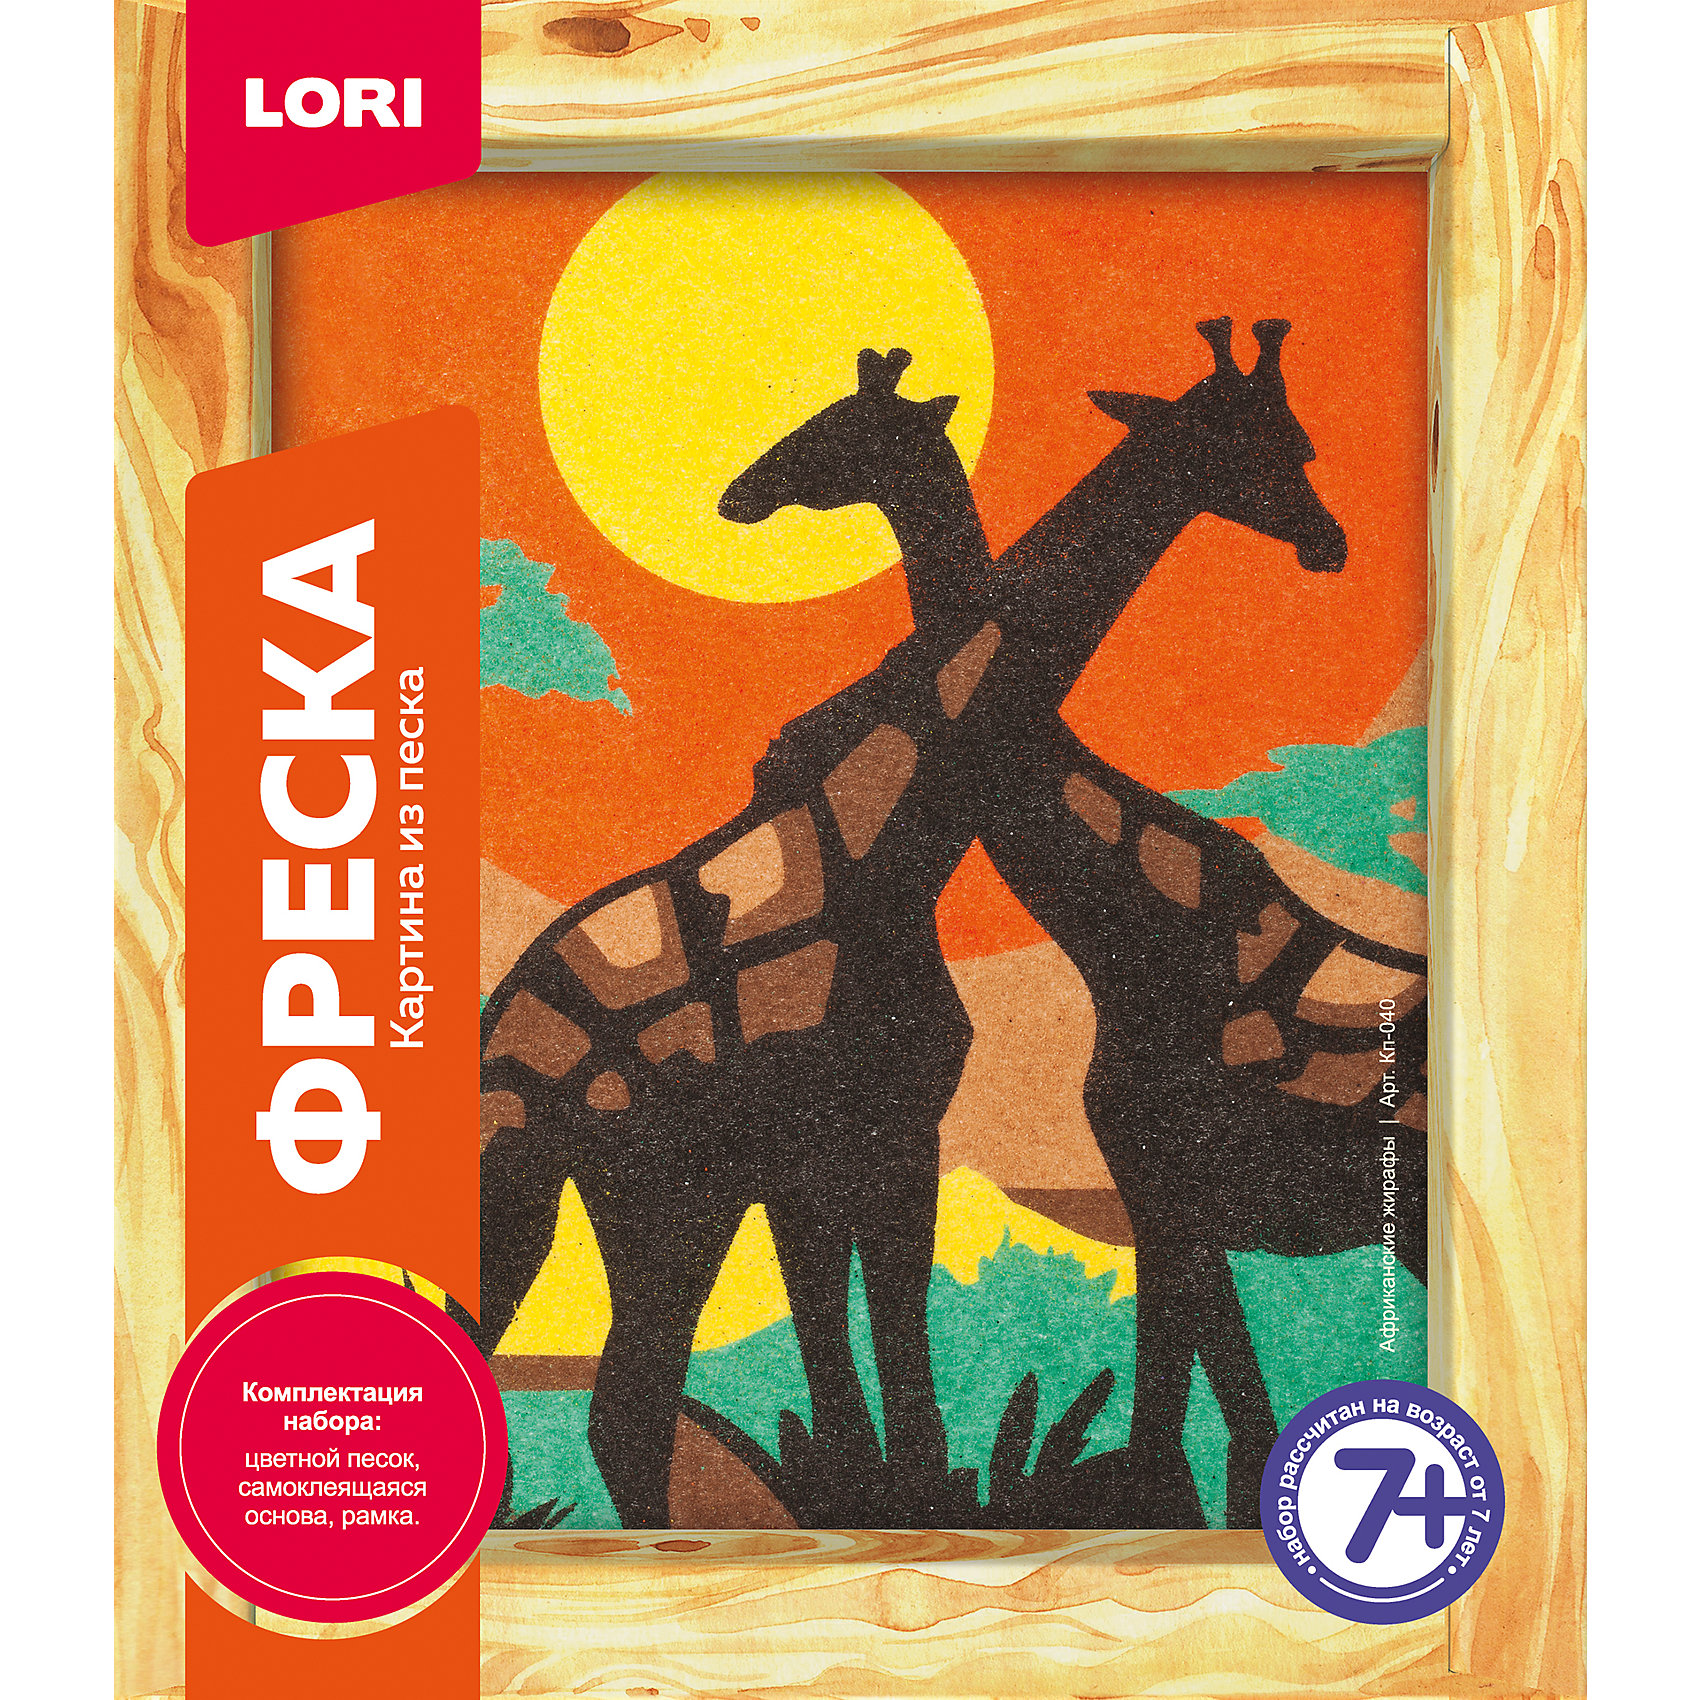 LORI Фреска, Картина из песка Африканские жирафы lori фоторамки из гипса на клумбе